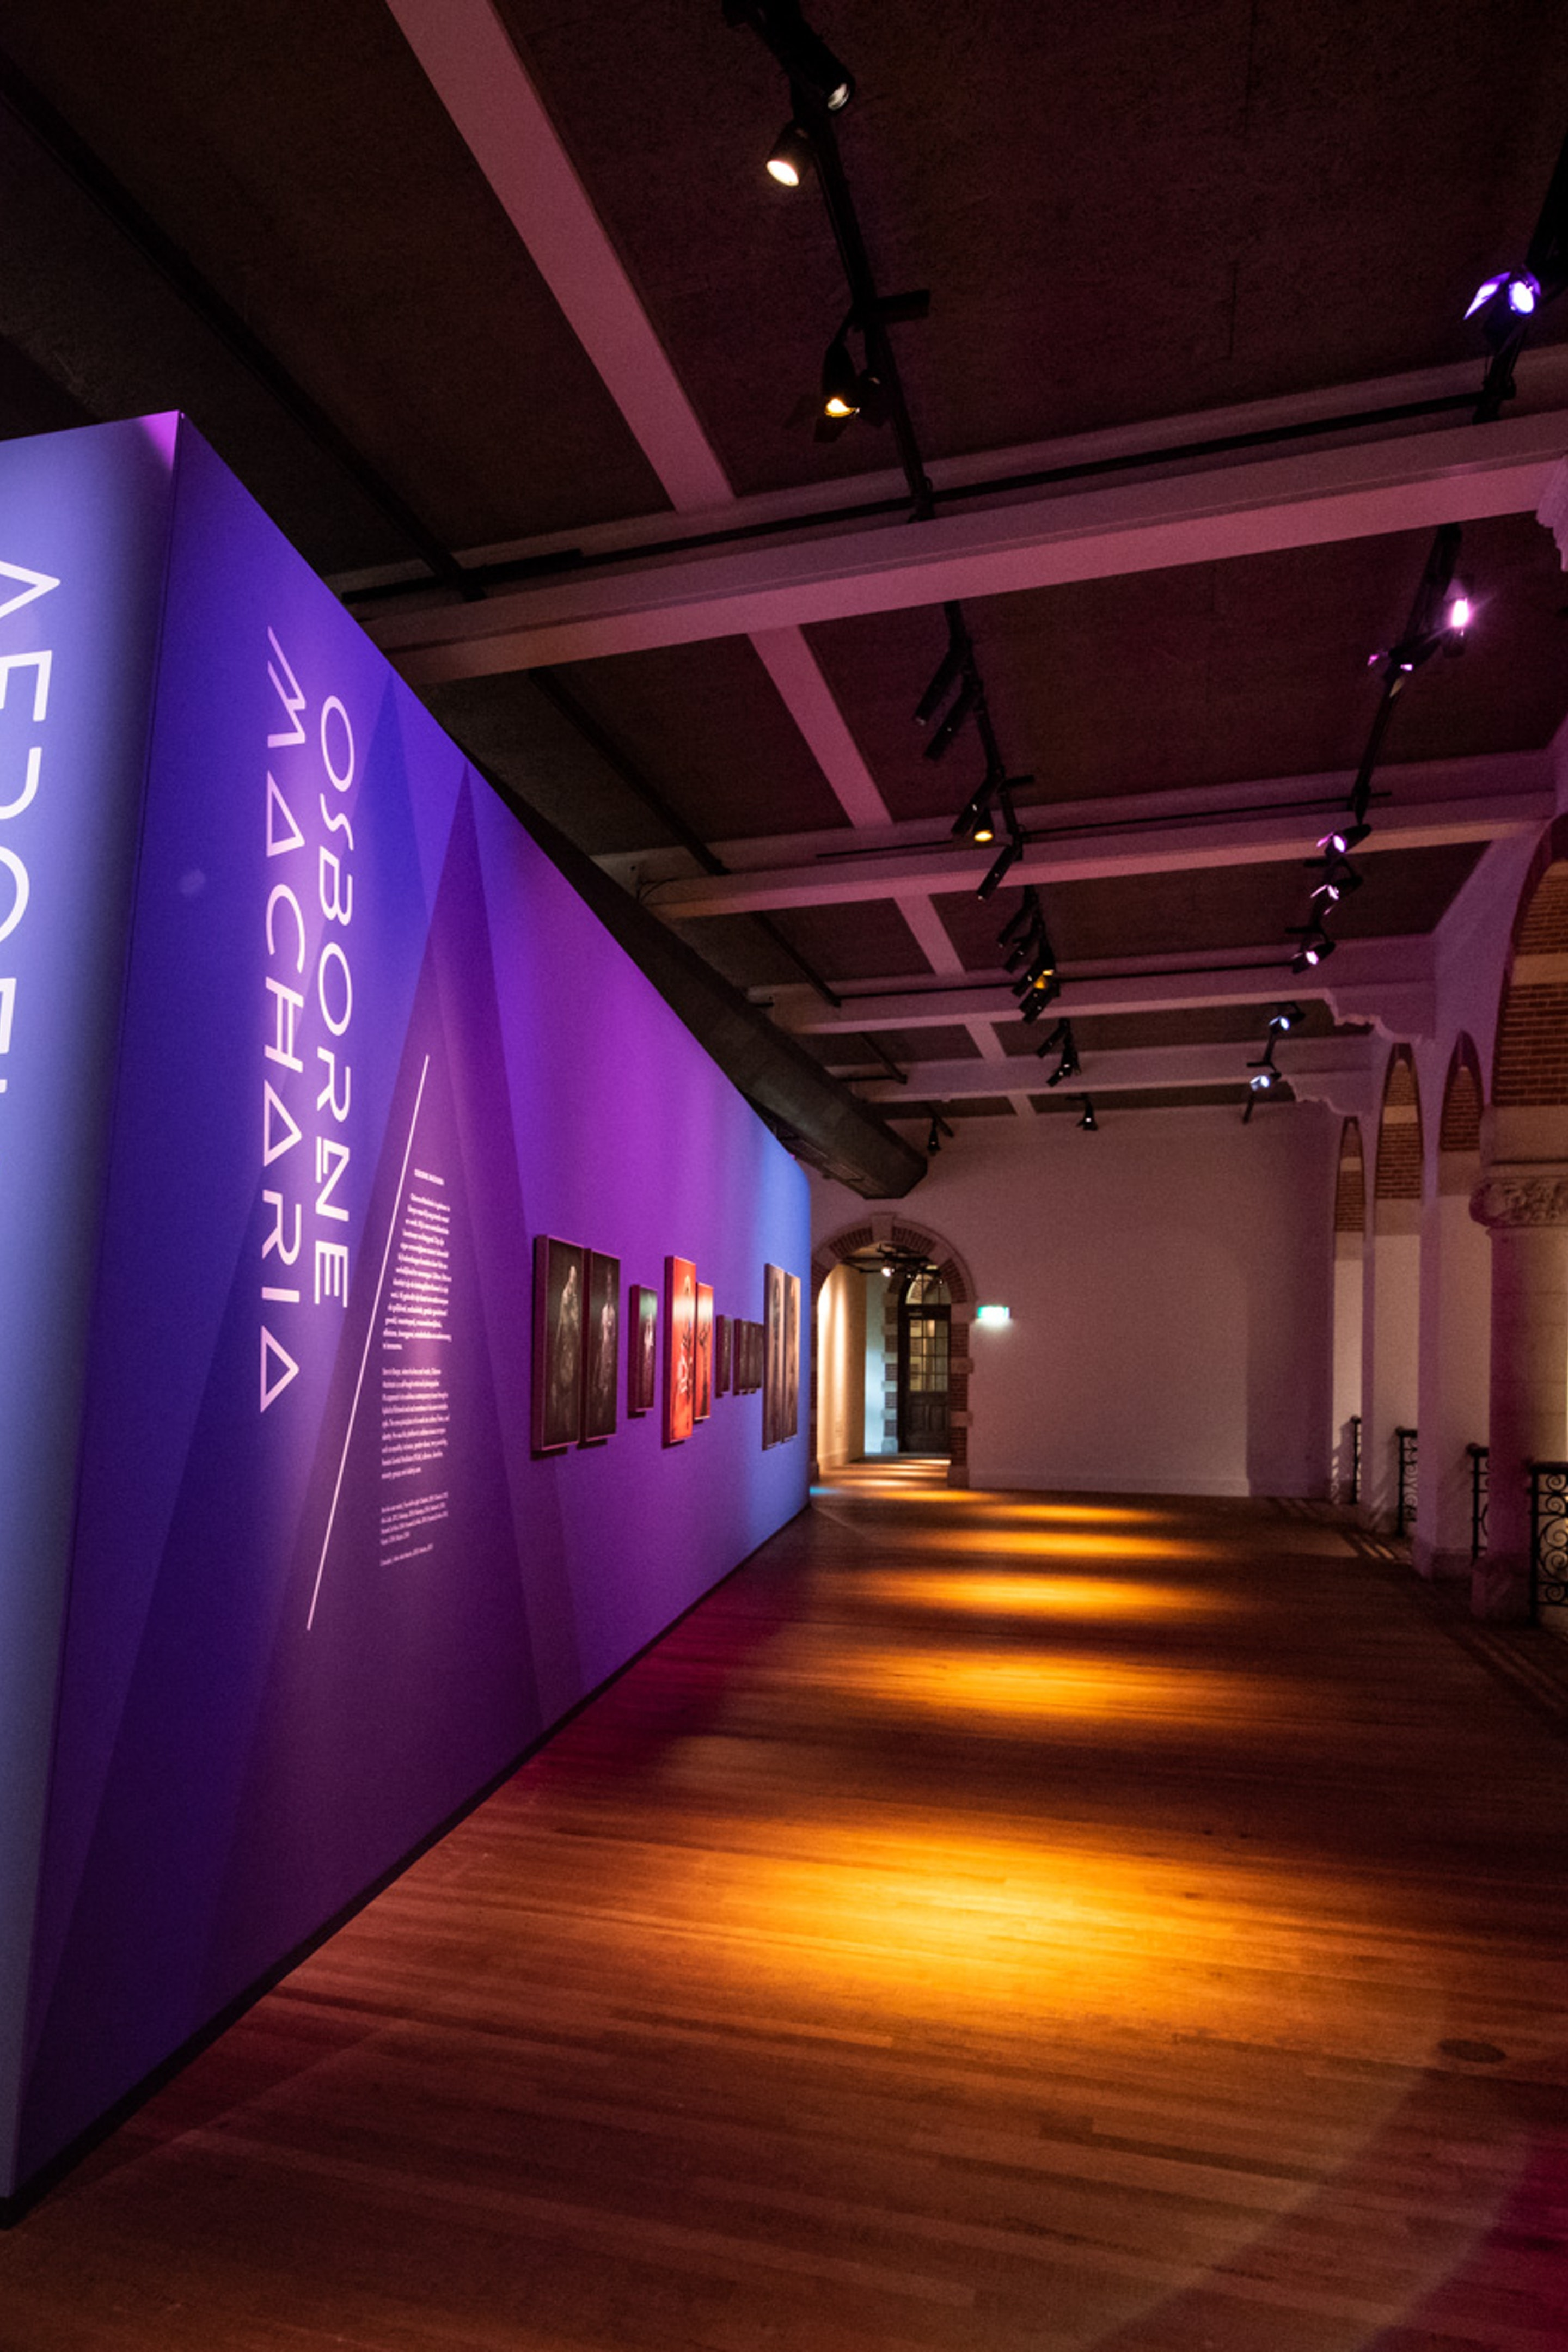 TROPEN MUSEUM: Afrofuturism Exhibition